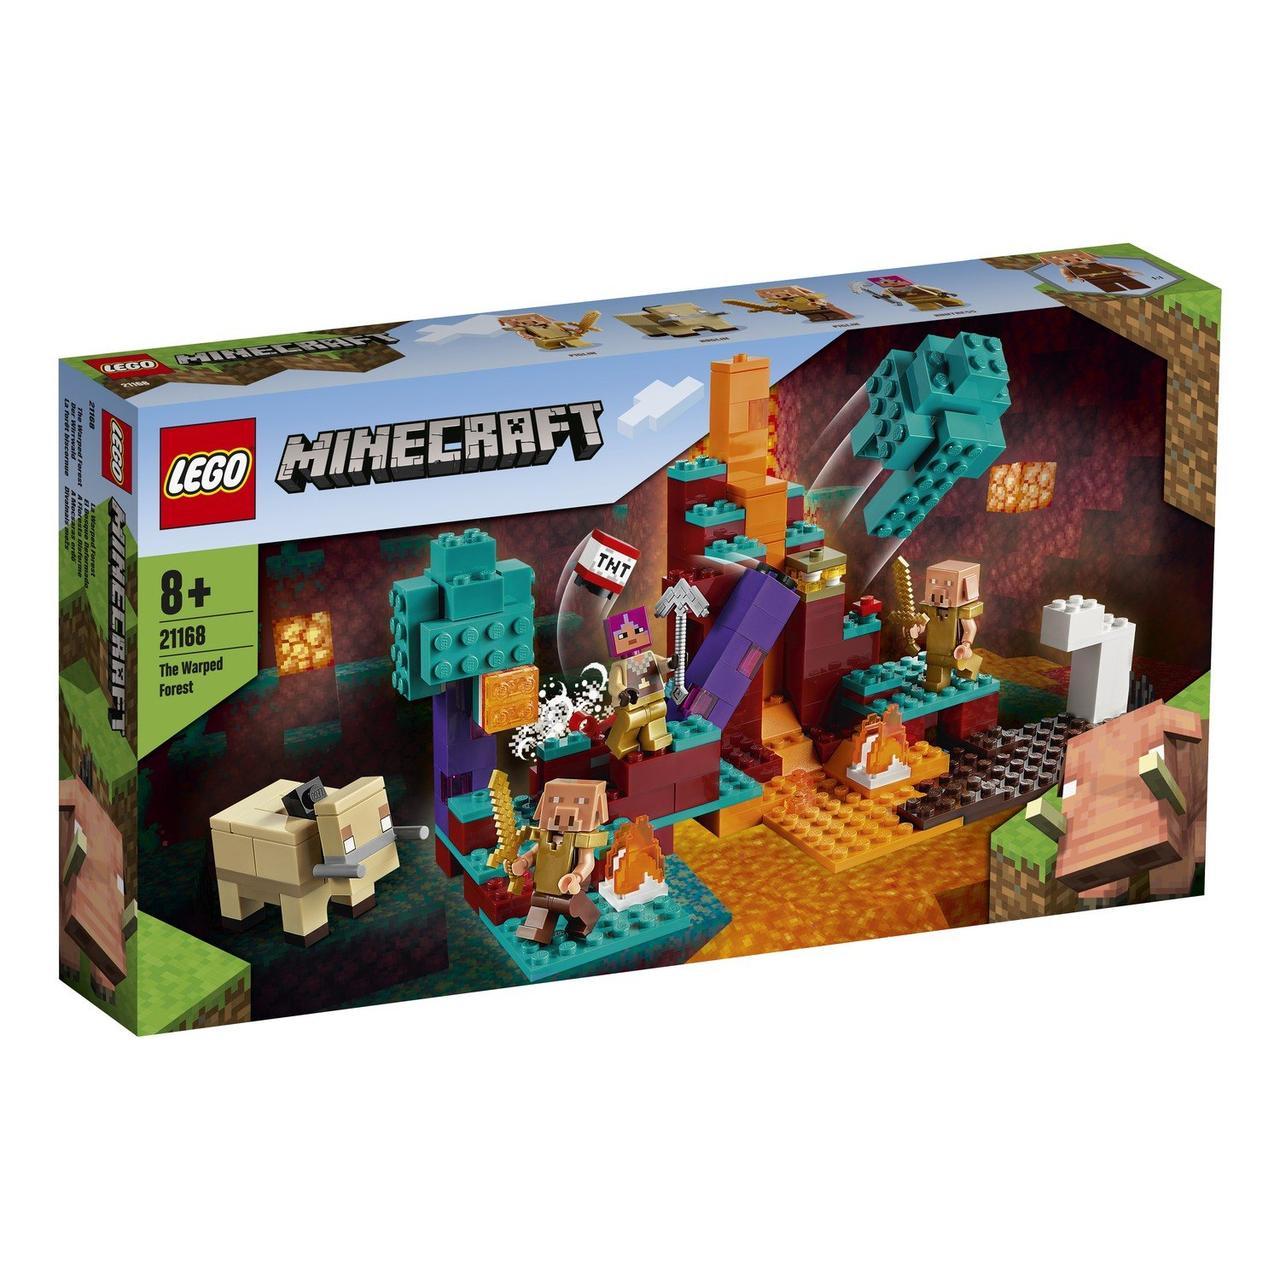 21168 Lego Minecraft Искажённый лес, Лего Майнкрафт